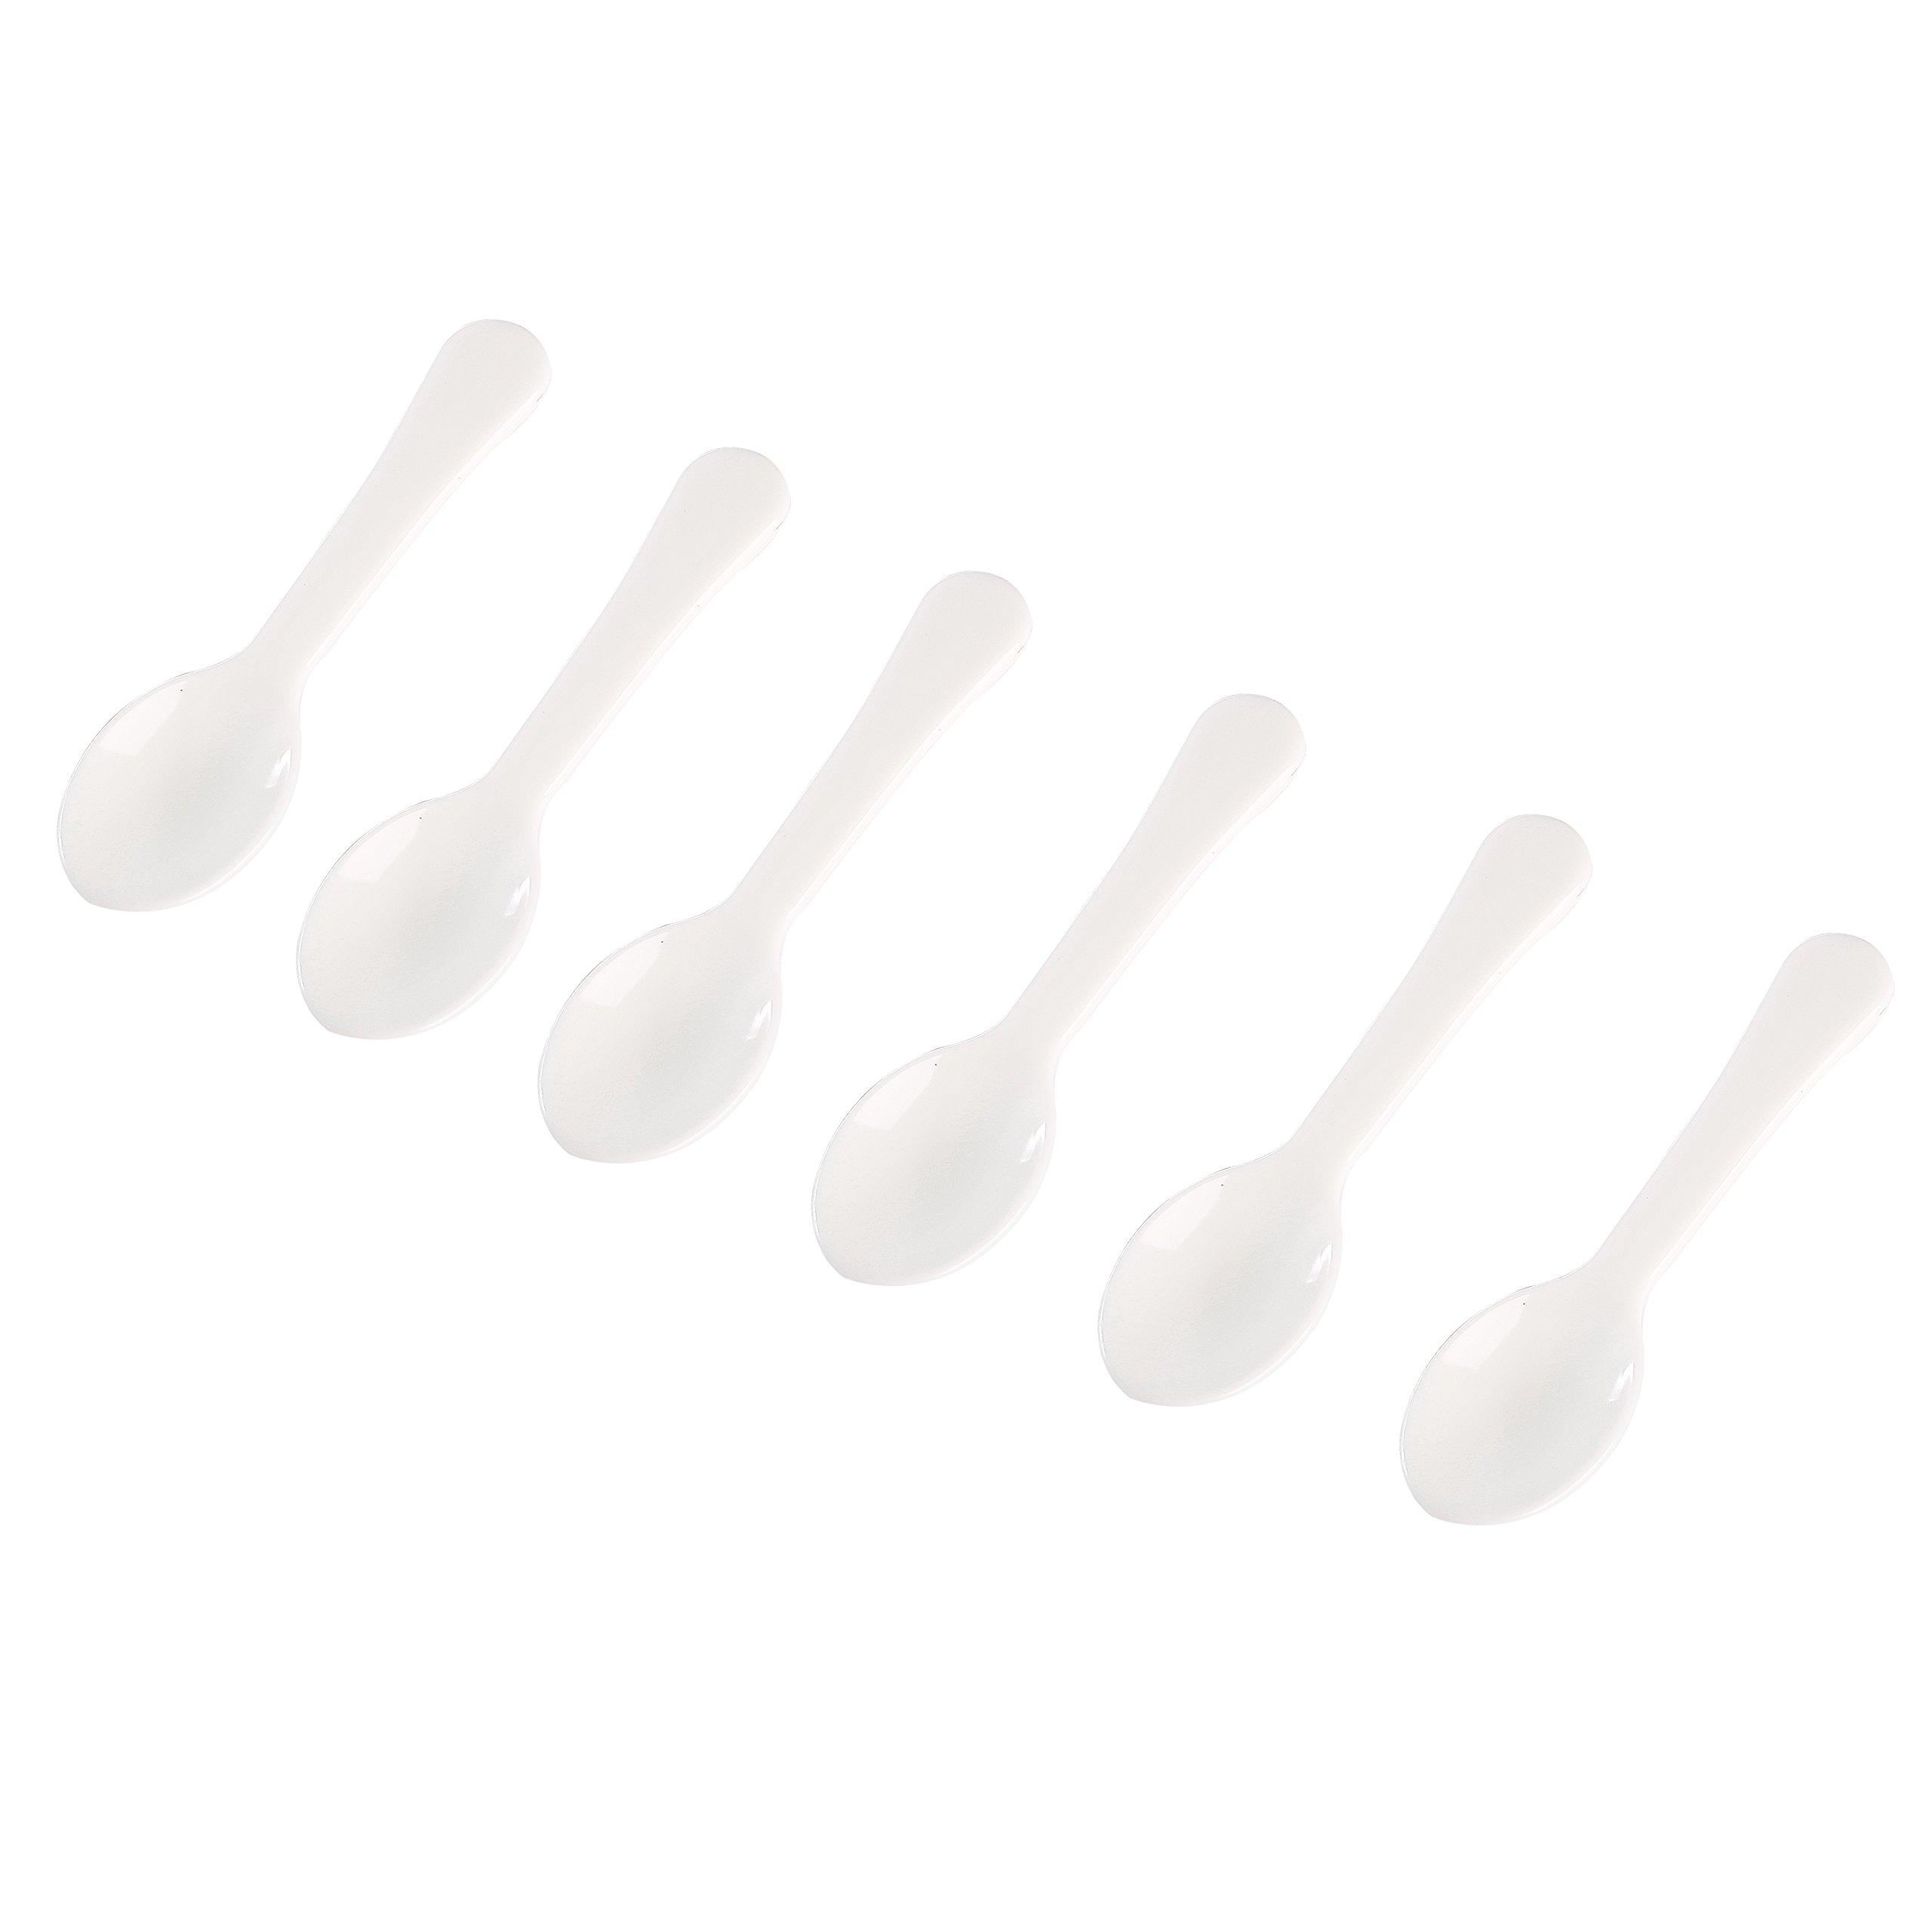 Gmark 3000pc 3'' Taster Spoons Plastic Mini Spoons, Ice Cream Spoons Dessert Spoons White 1 Box Set GM1002E by Gmark